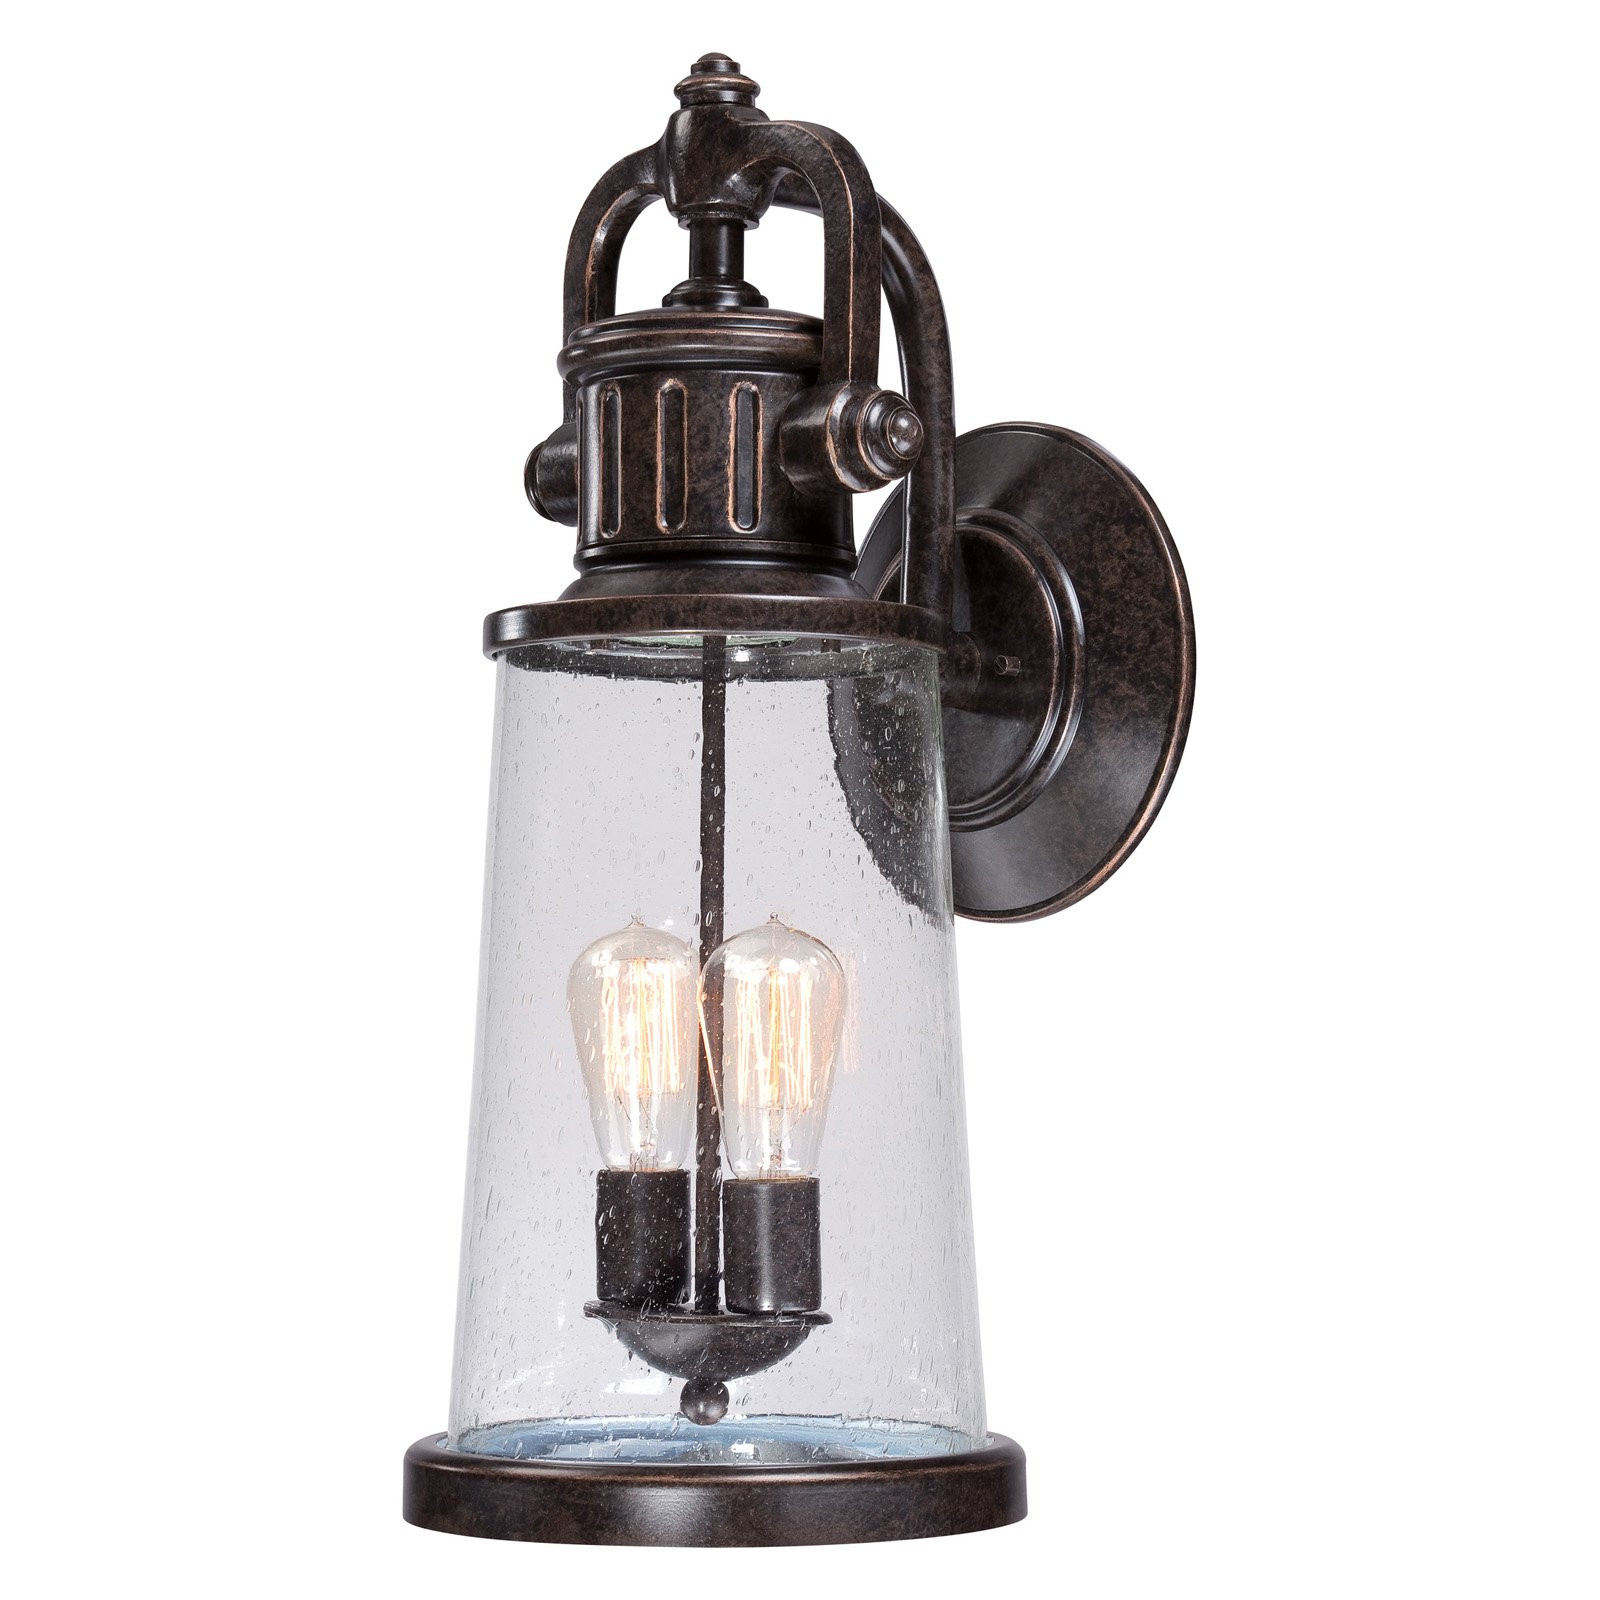 Quoizel Steadman SDN8409IB Outdoor Wall Lantern